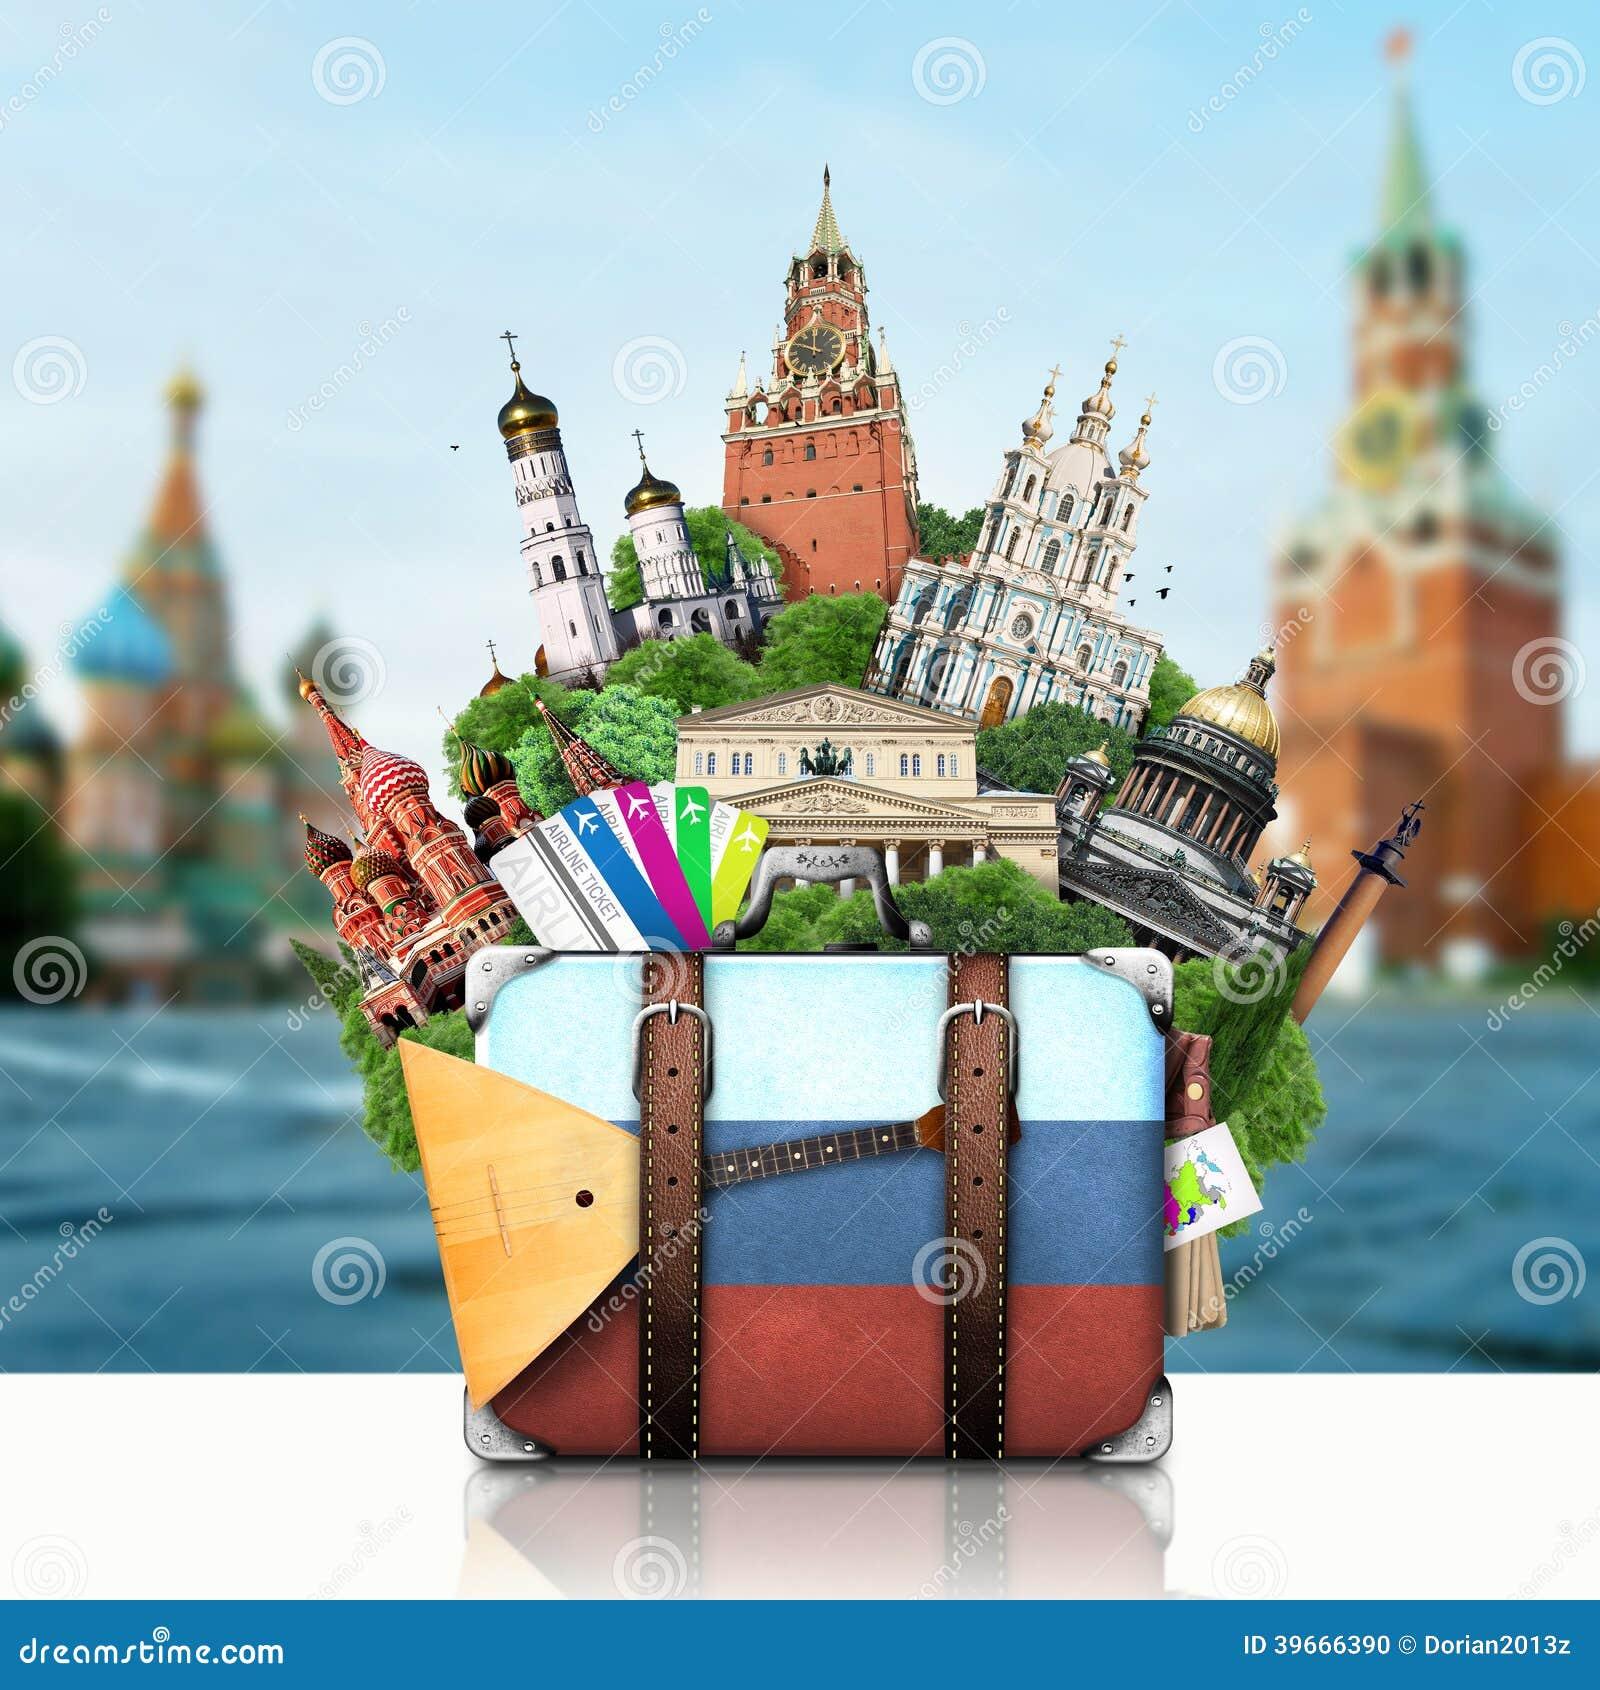 Rusland, oriëntatiepunten Moskou, retro koffer